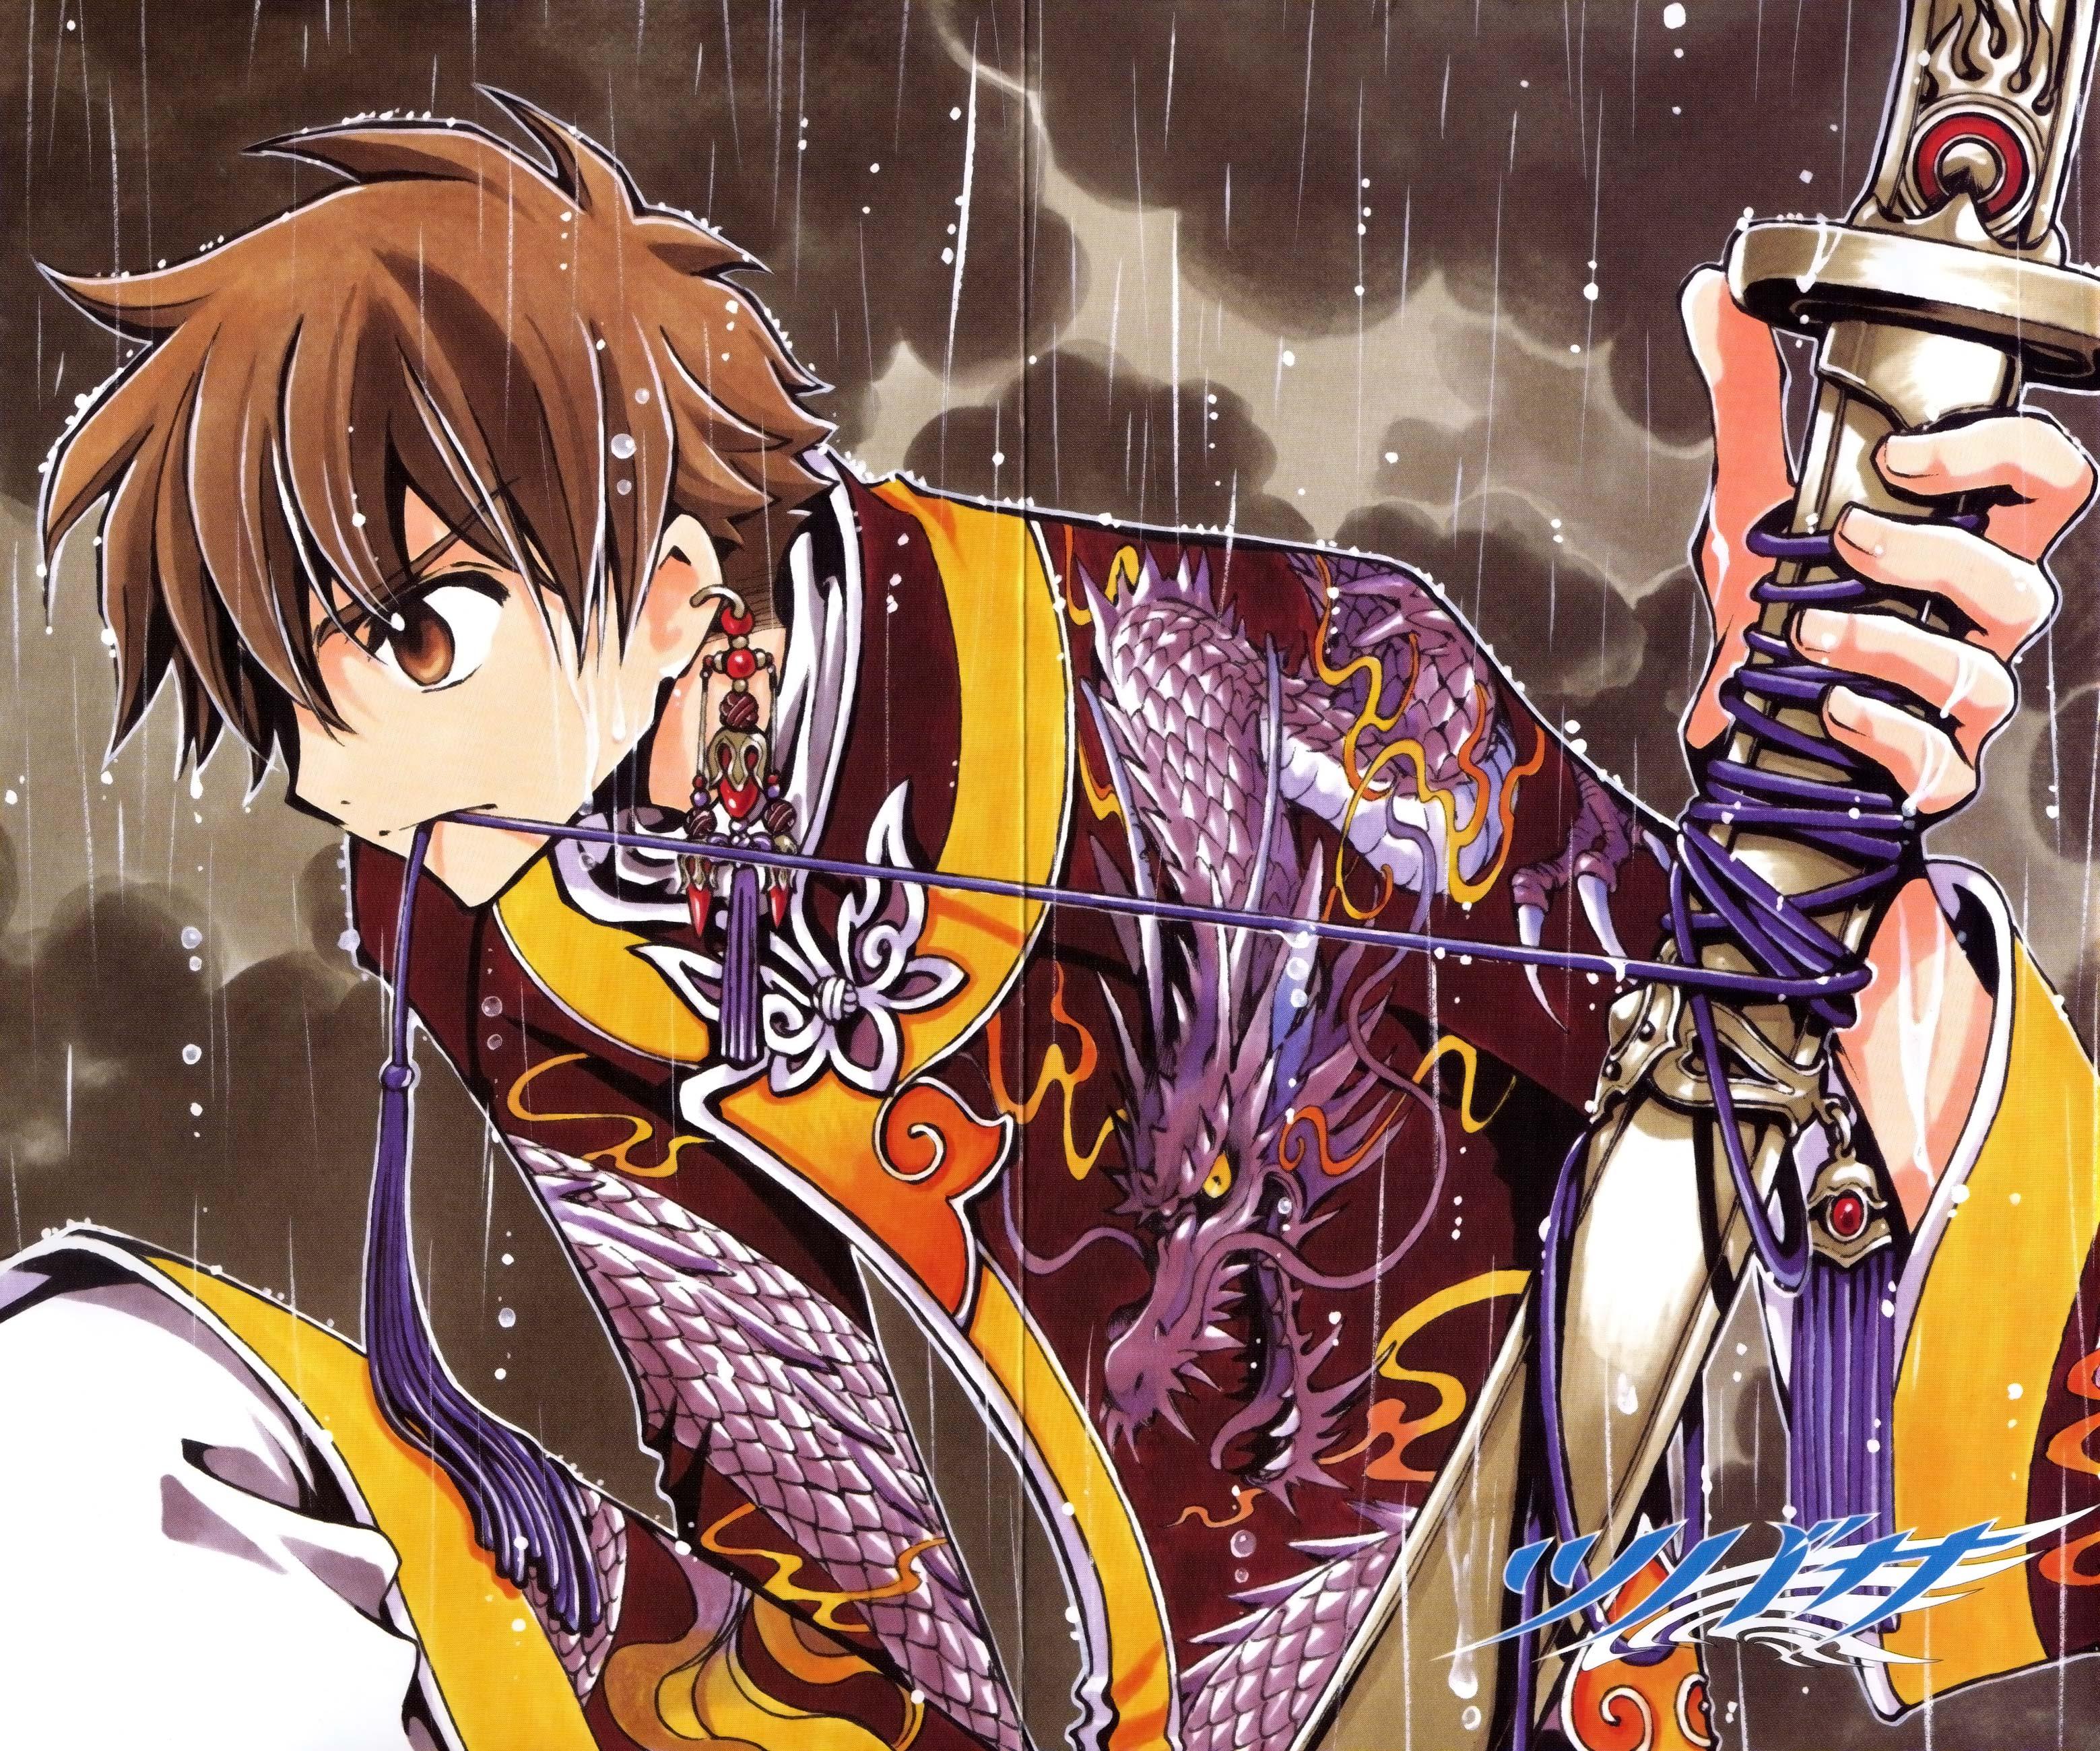 Tsubasa Reservoir Chronicle: In The Rain